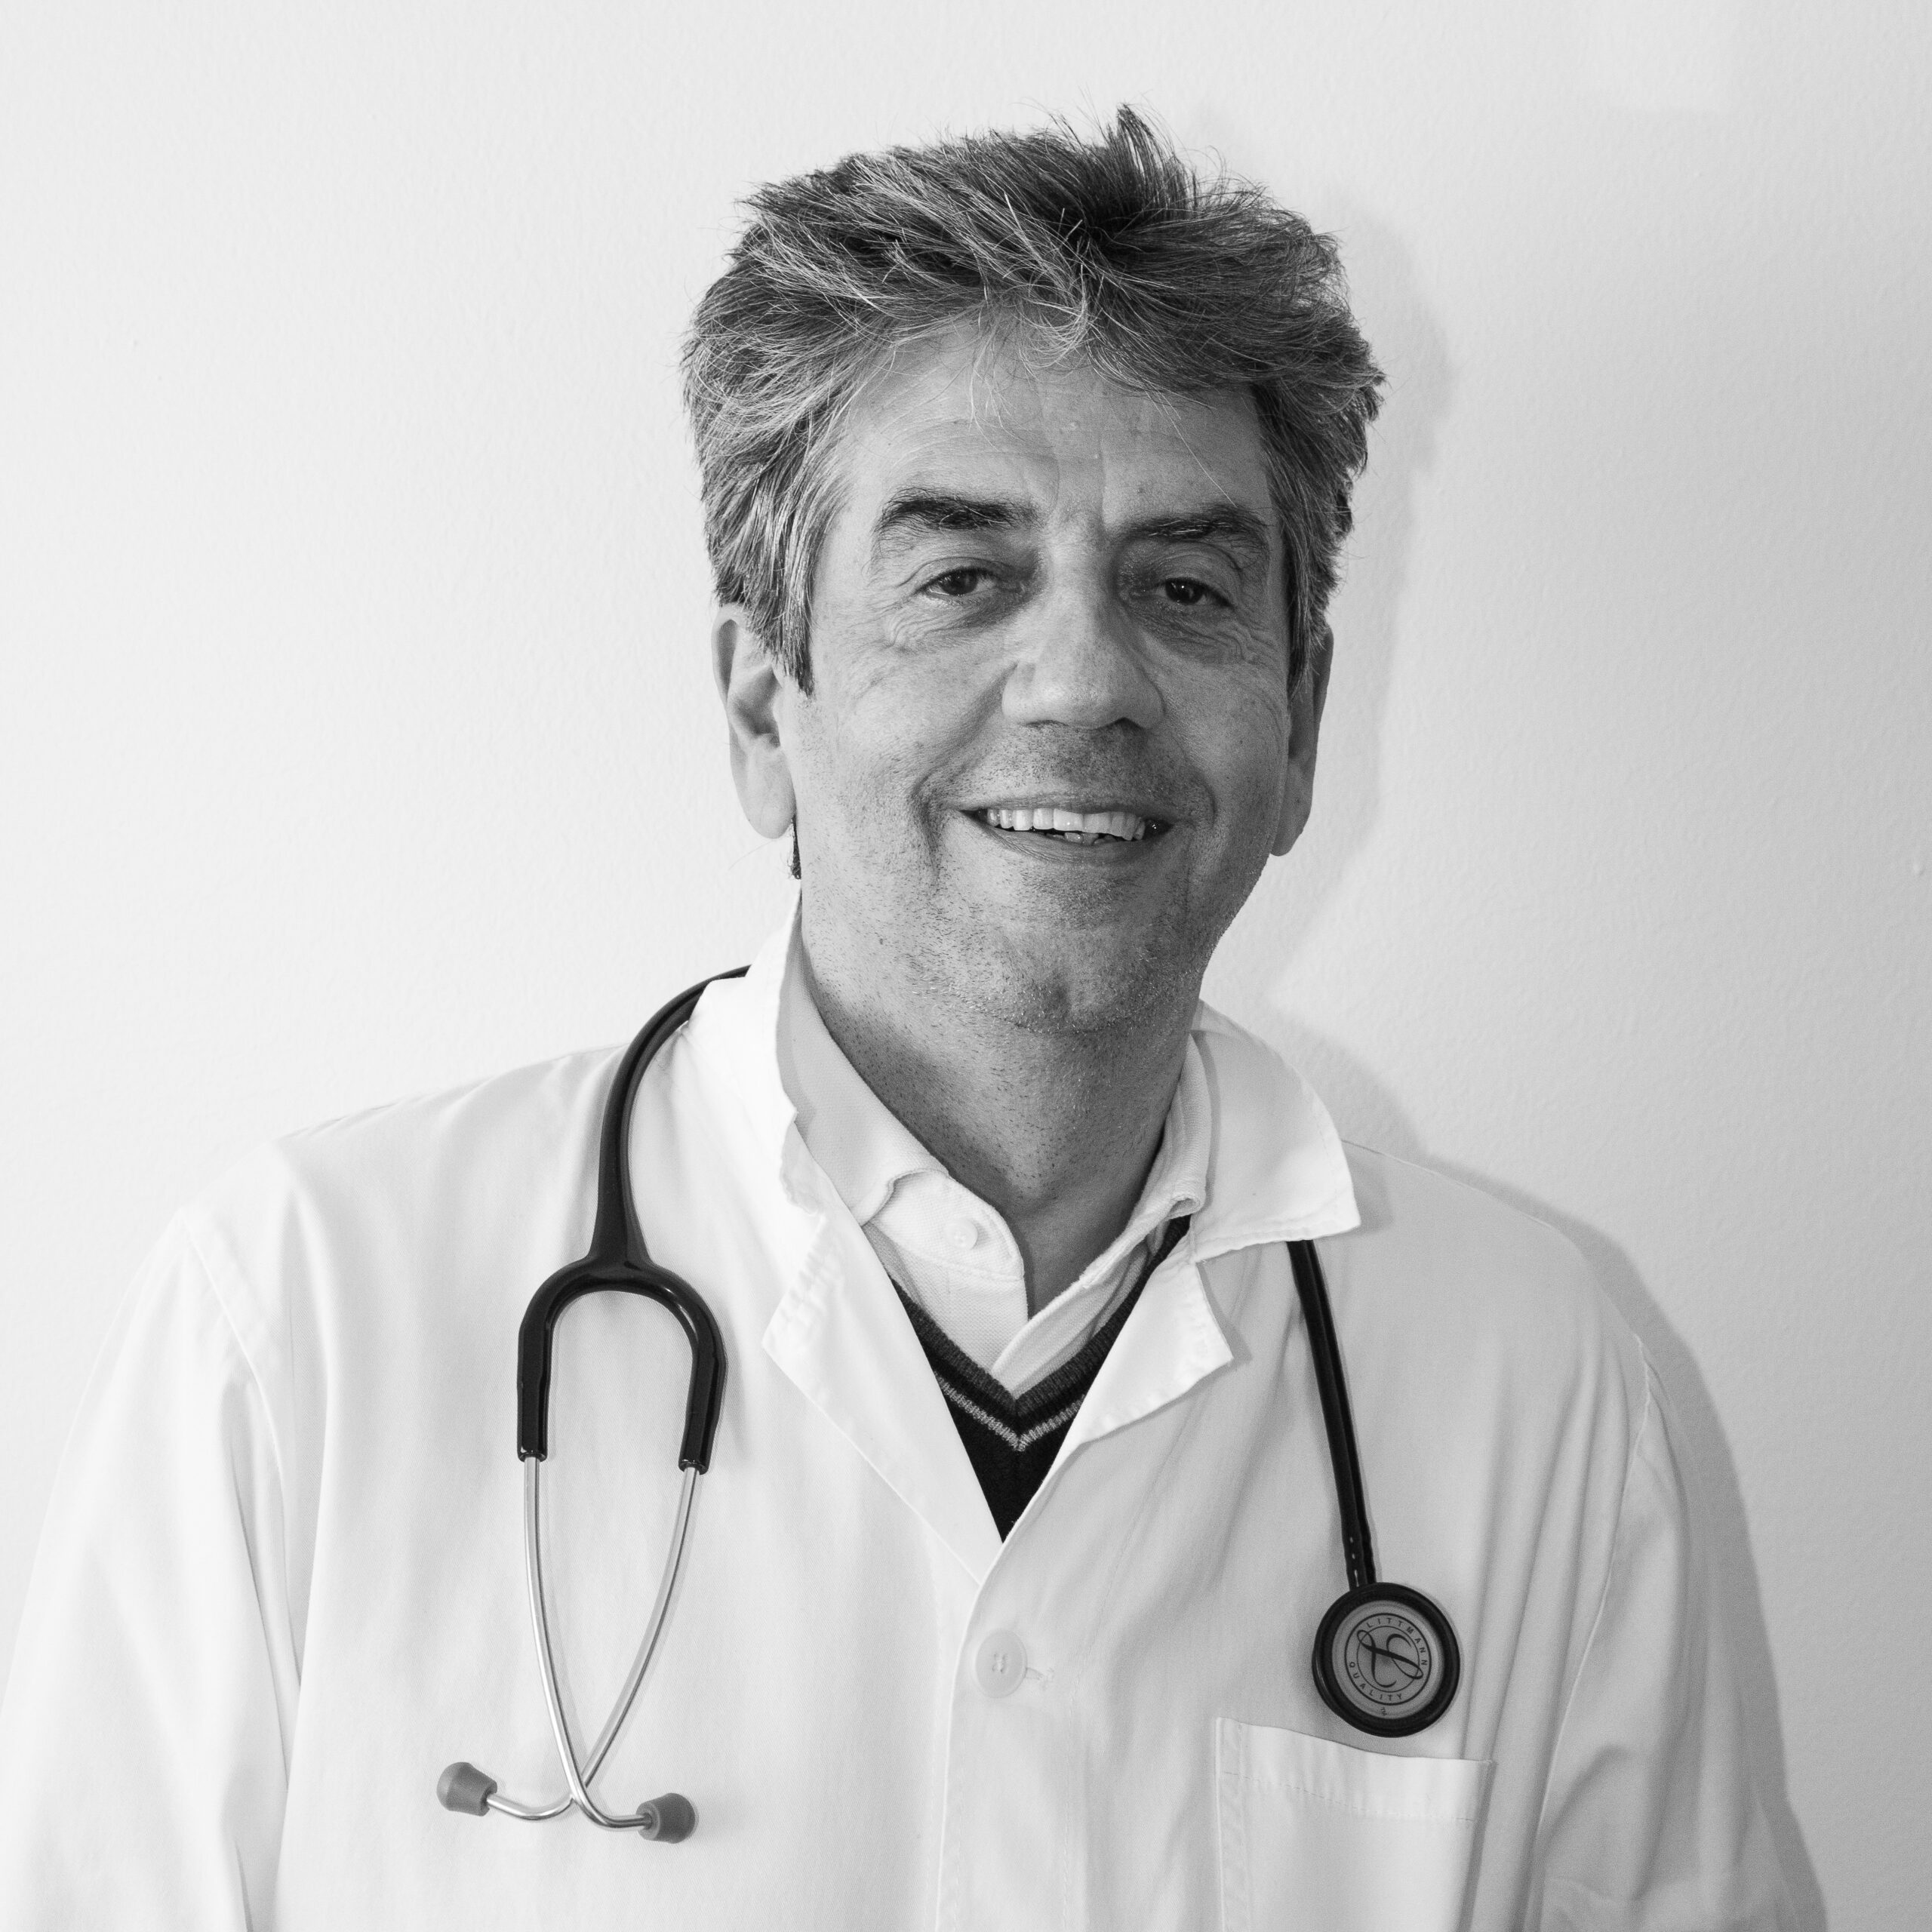 Dr. F. Ghiglione